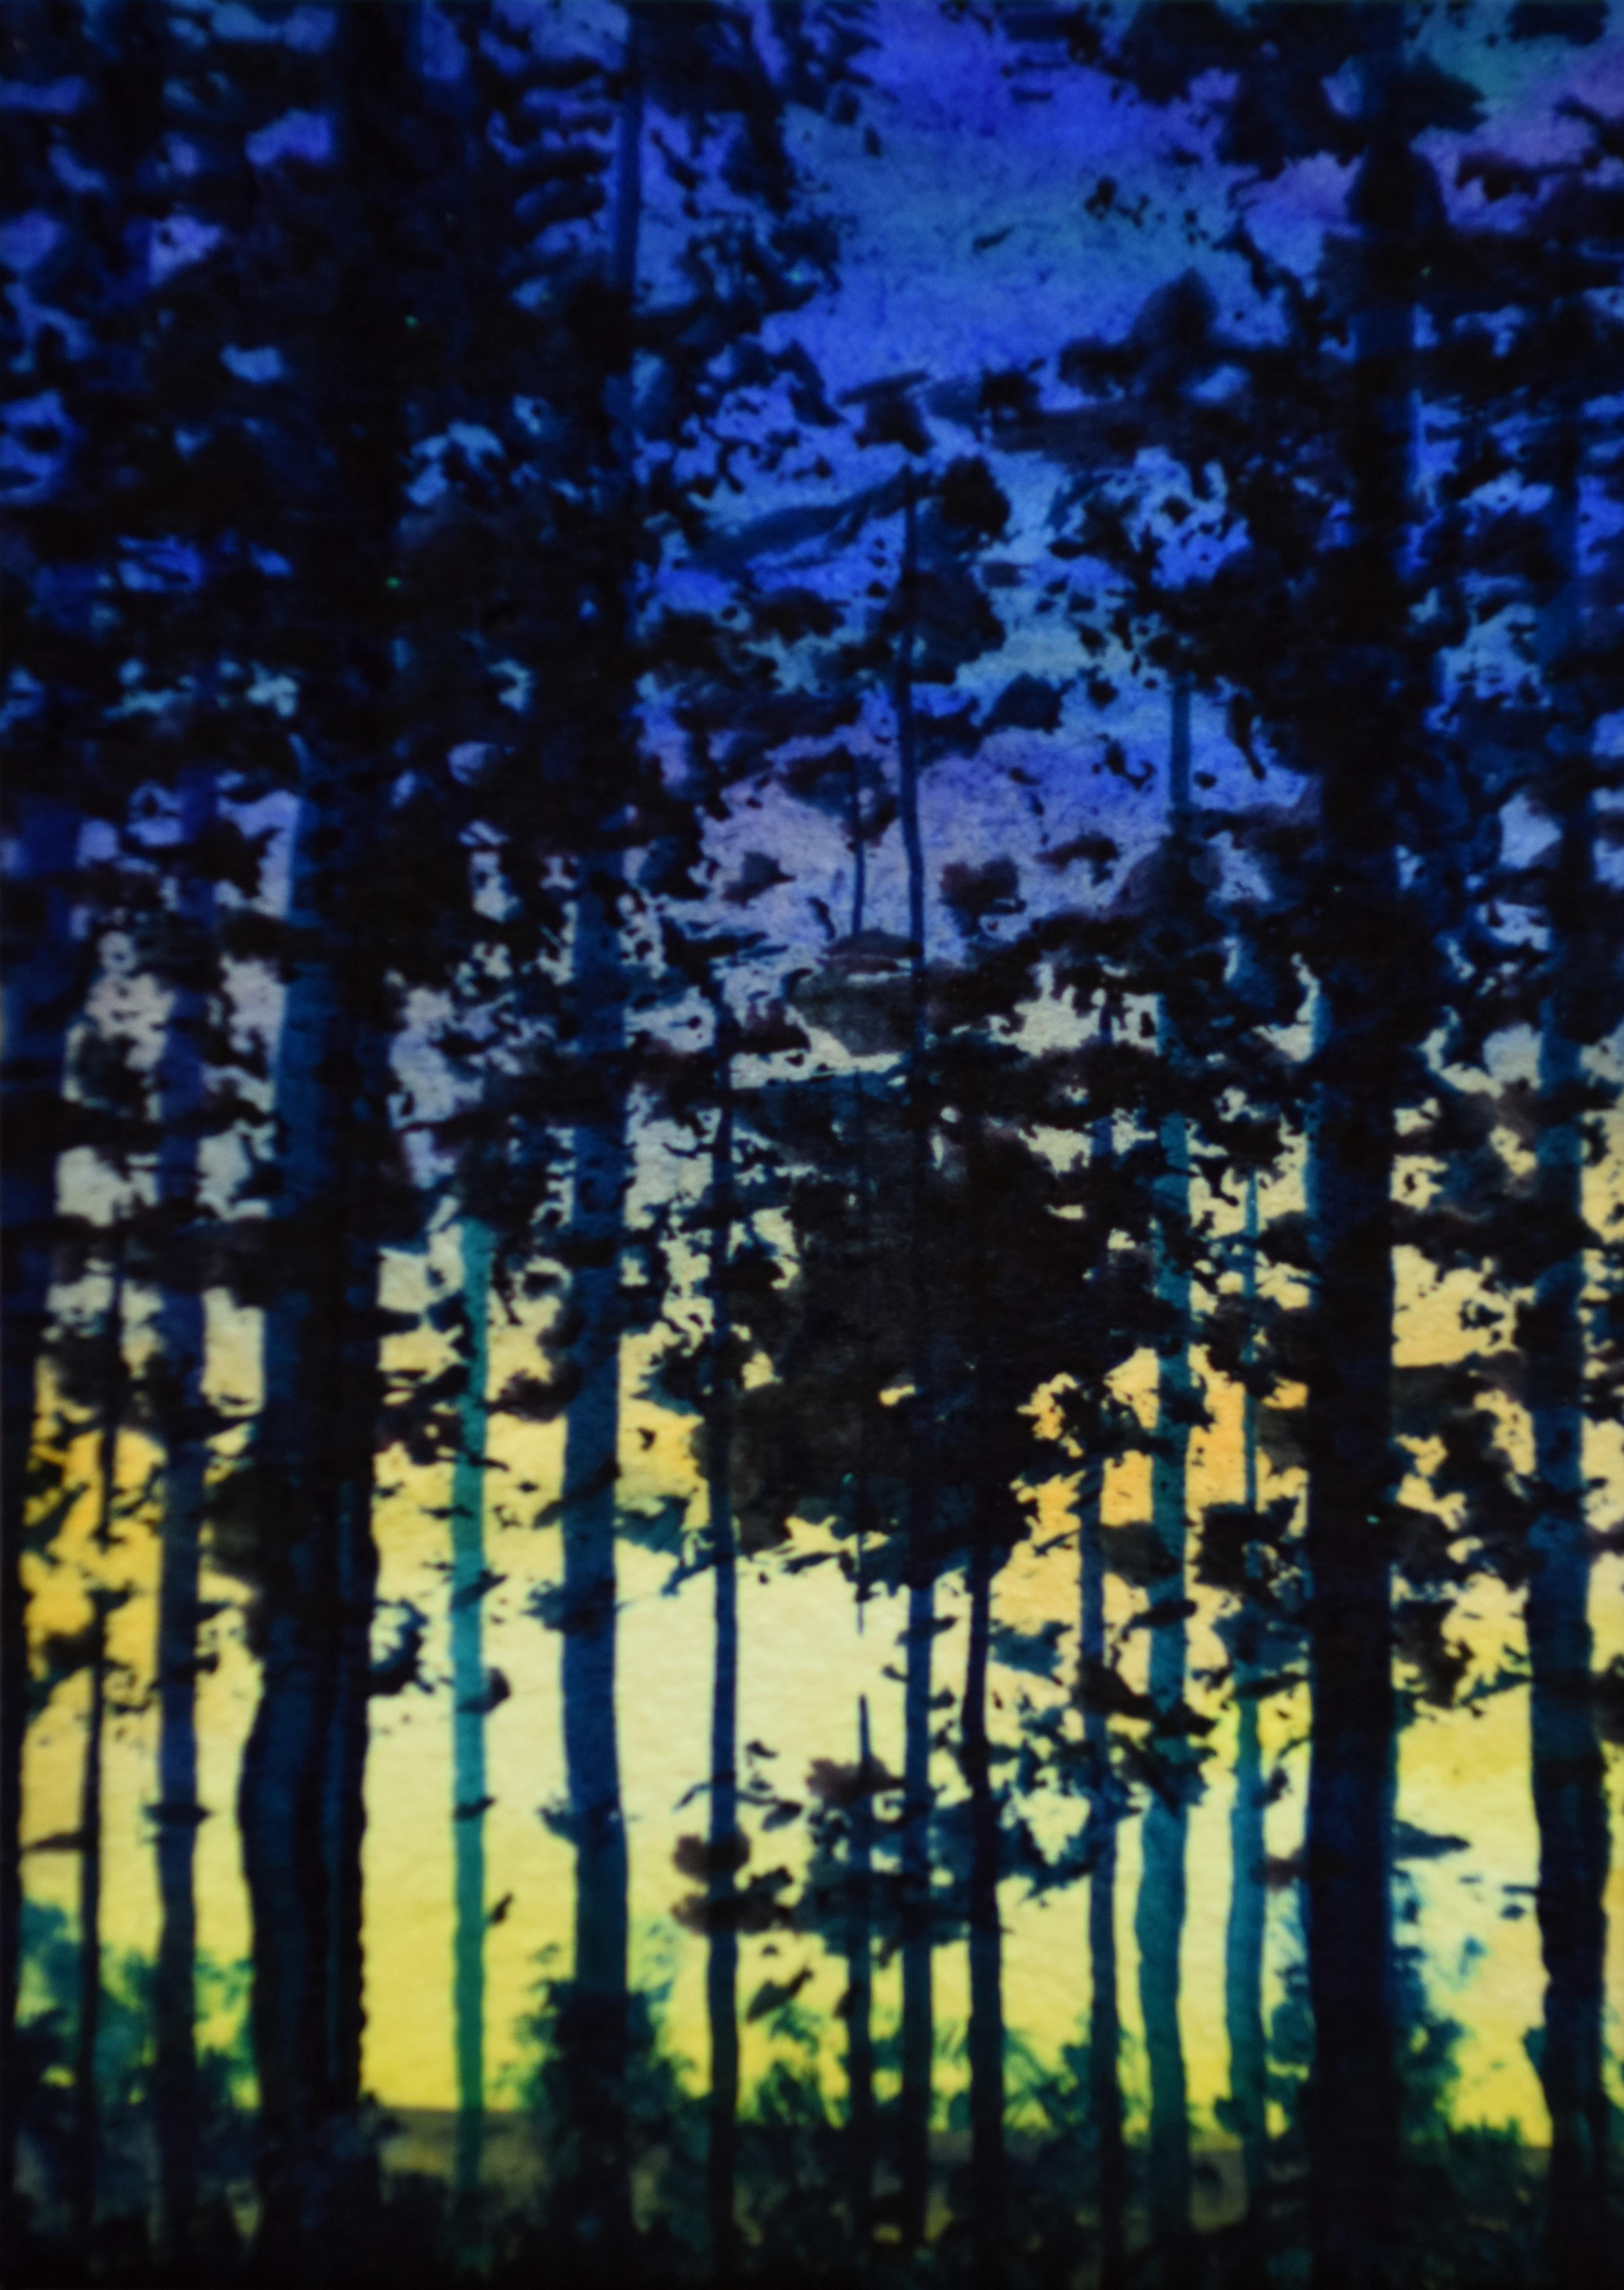 Evening in Wareham Forest